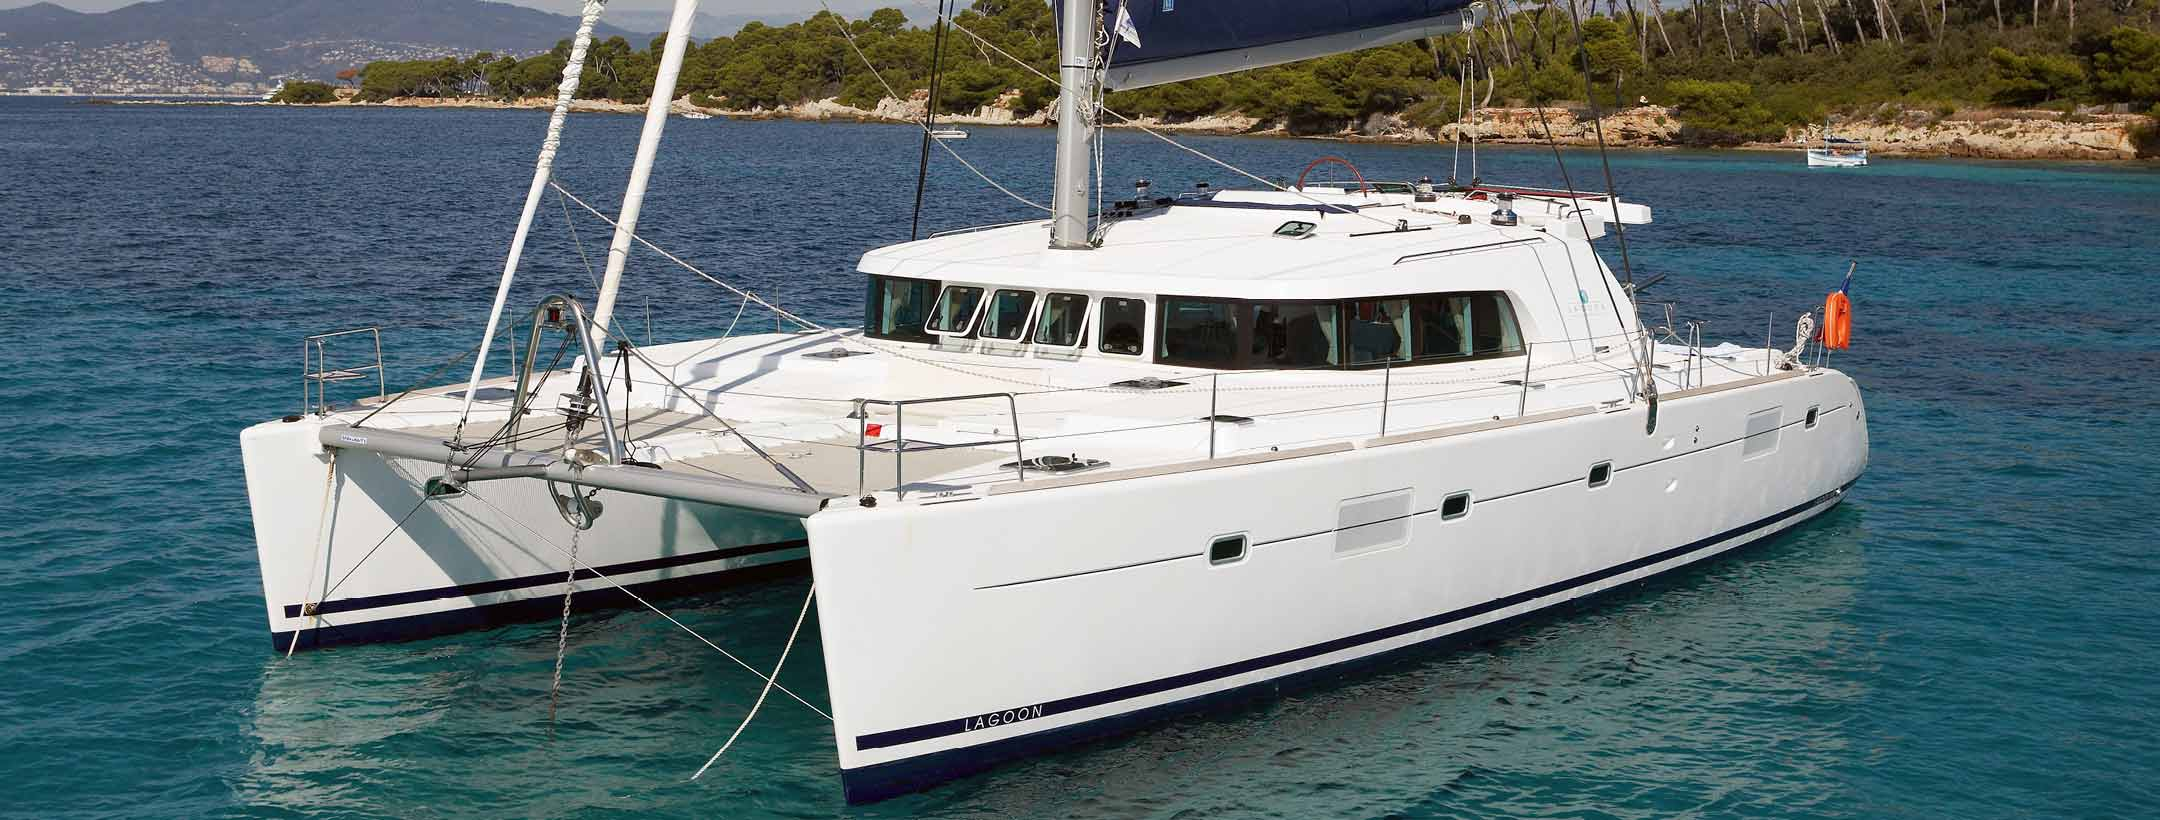 TradeWinds Lagoon 500 Cruising Class Yacht